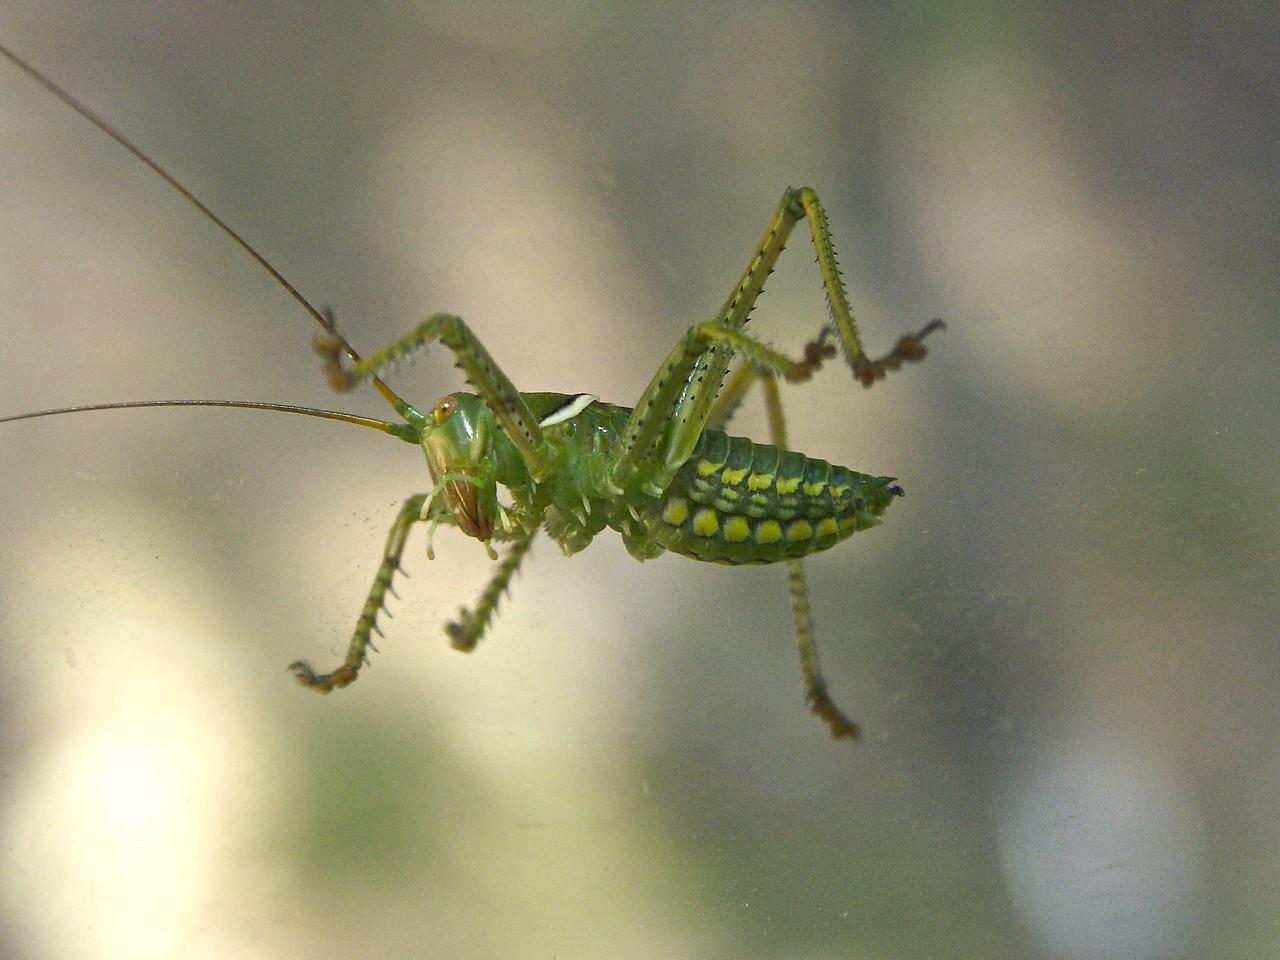 Grasshopper on the Window